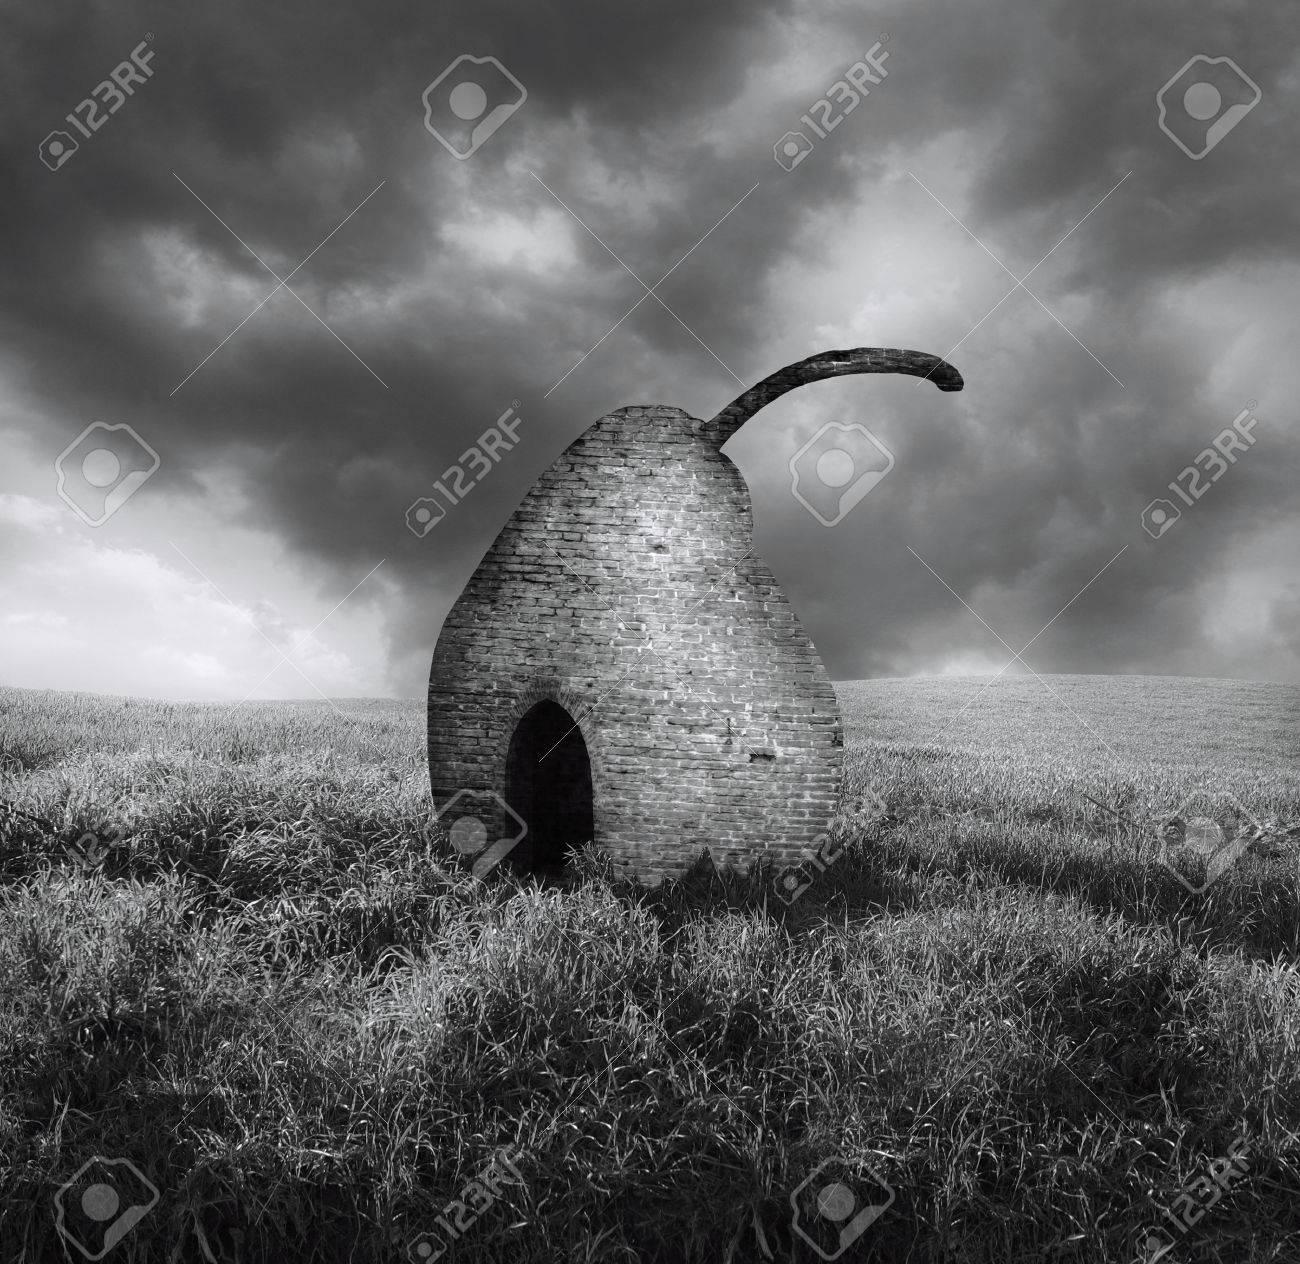 Elegant black and white surreal image representing a brick pearl